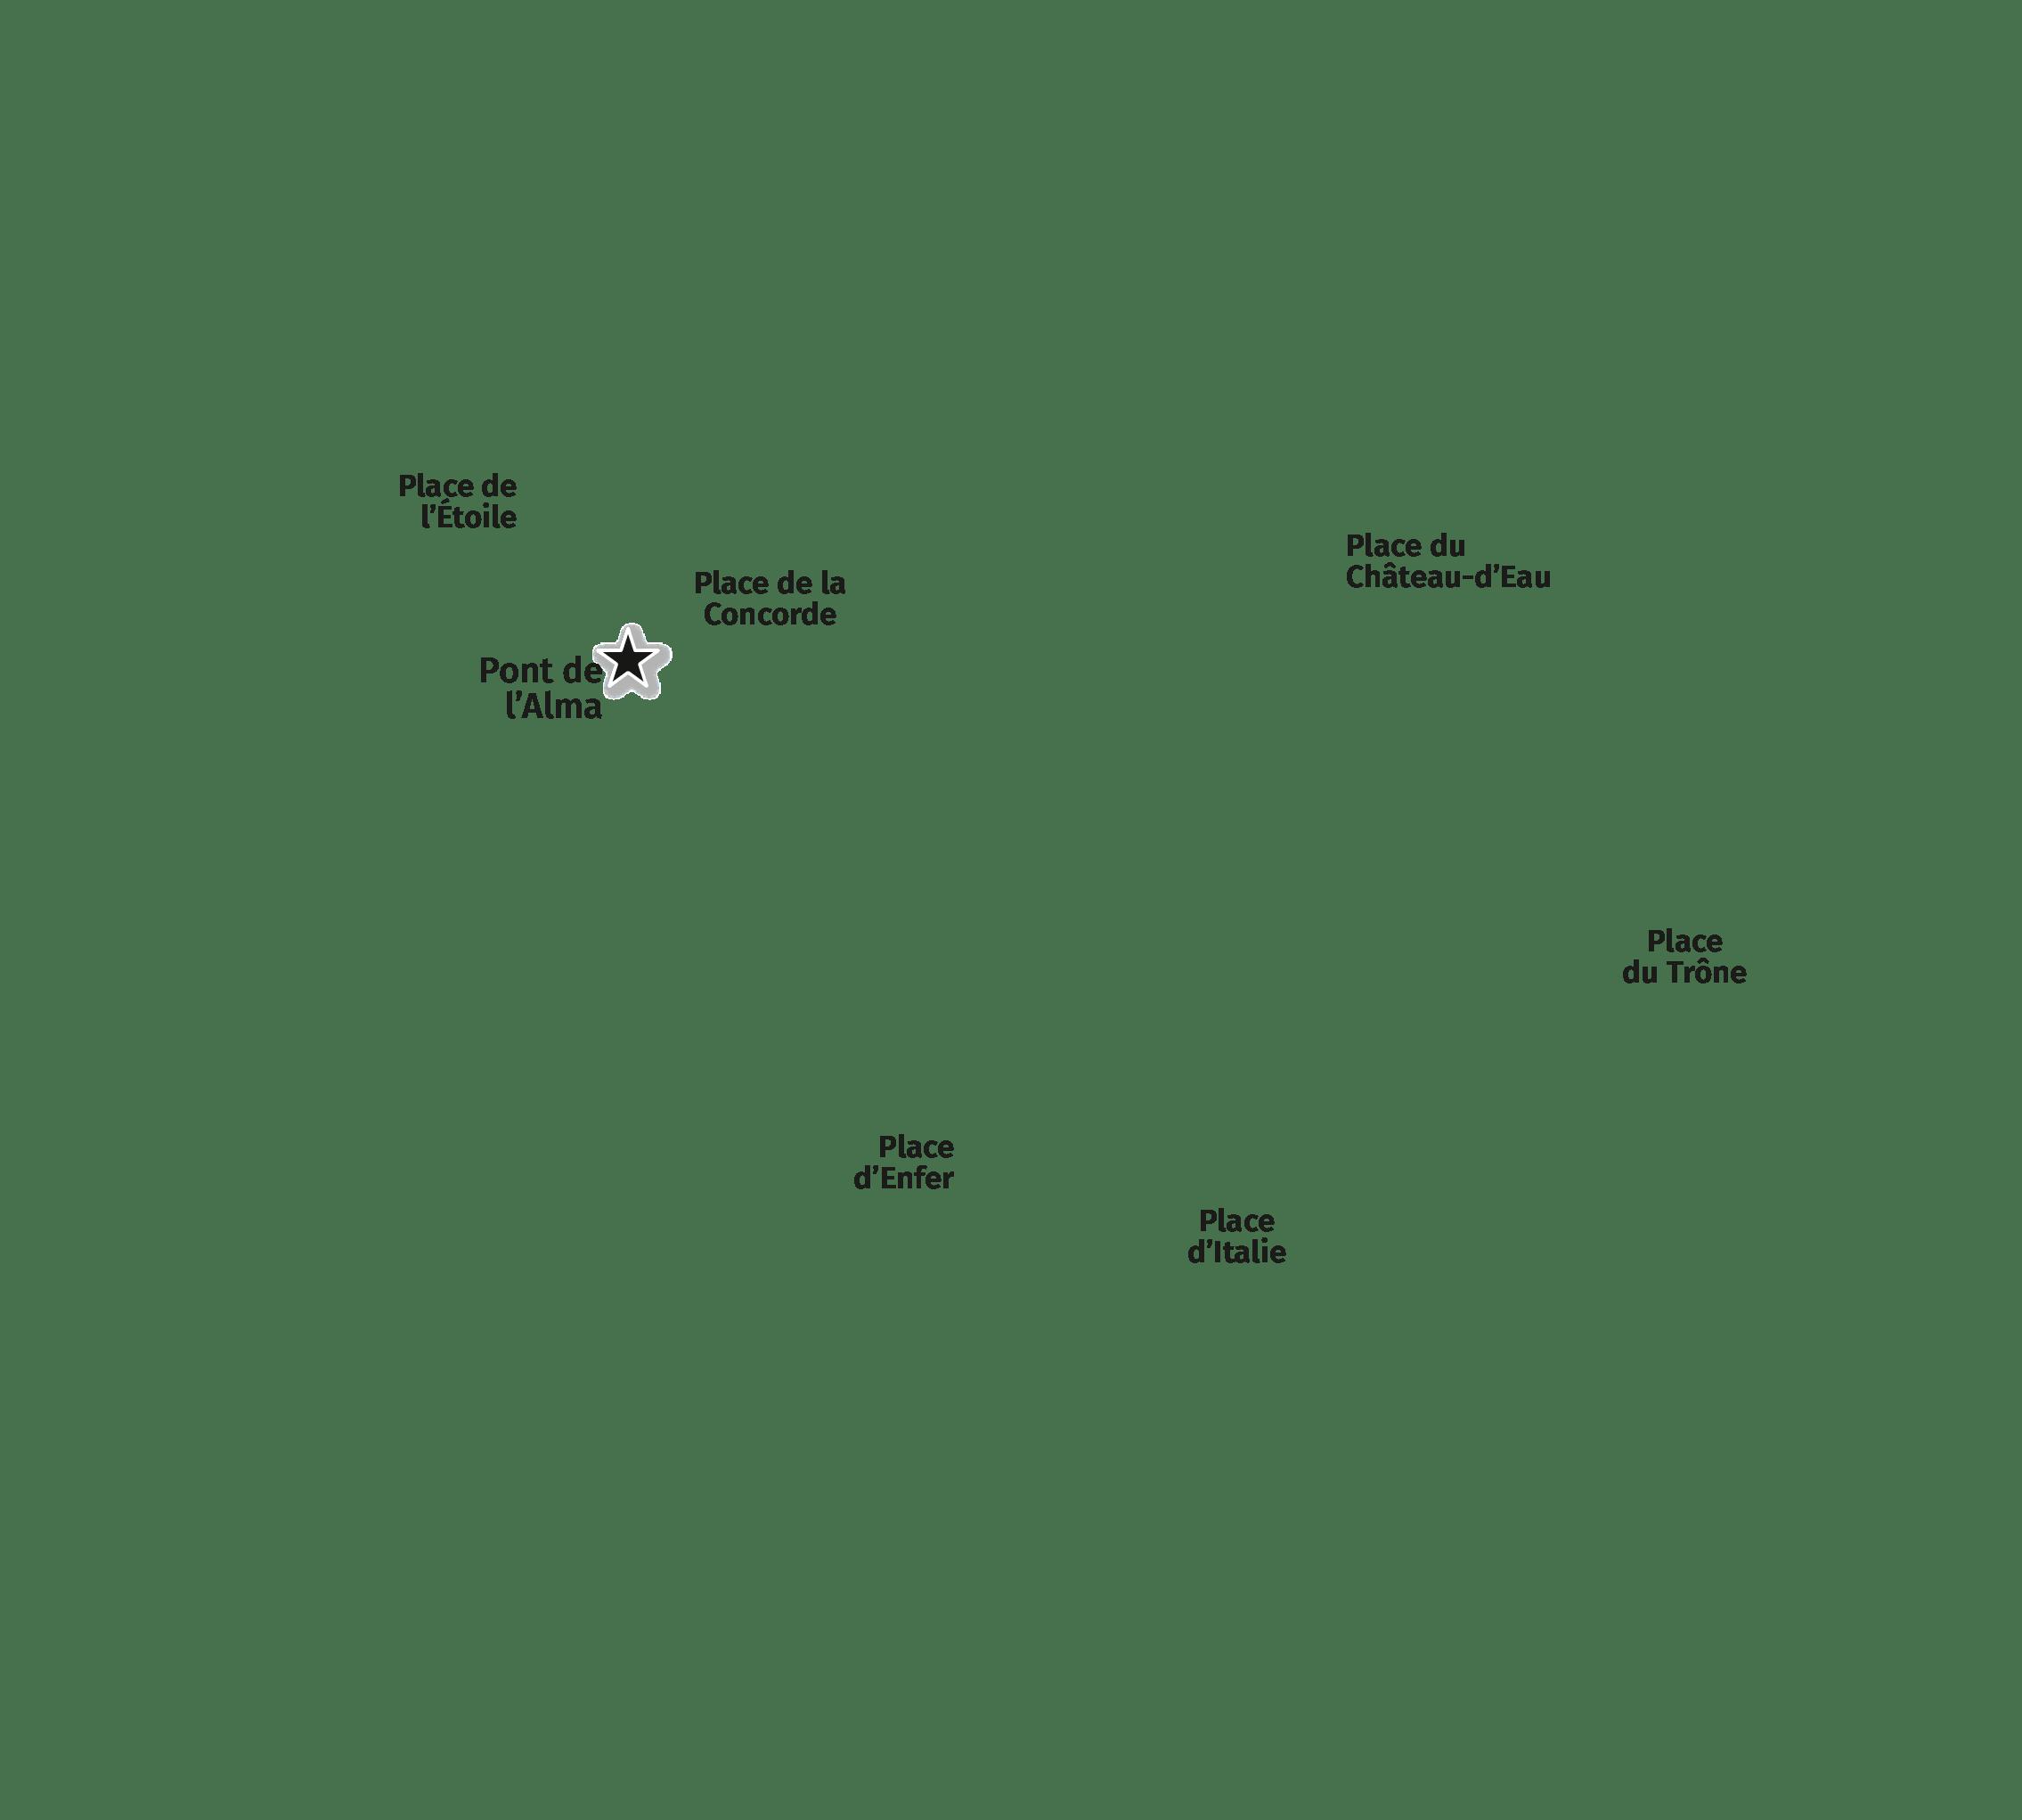 Aménagements sous Haussmann (texte)